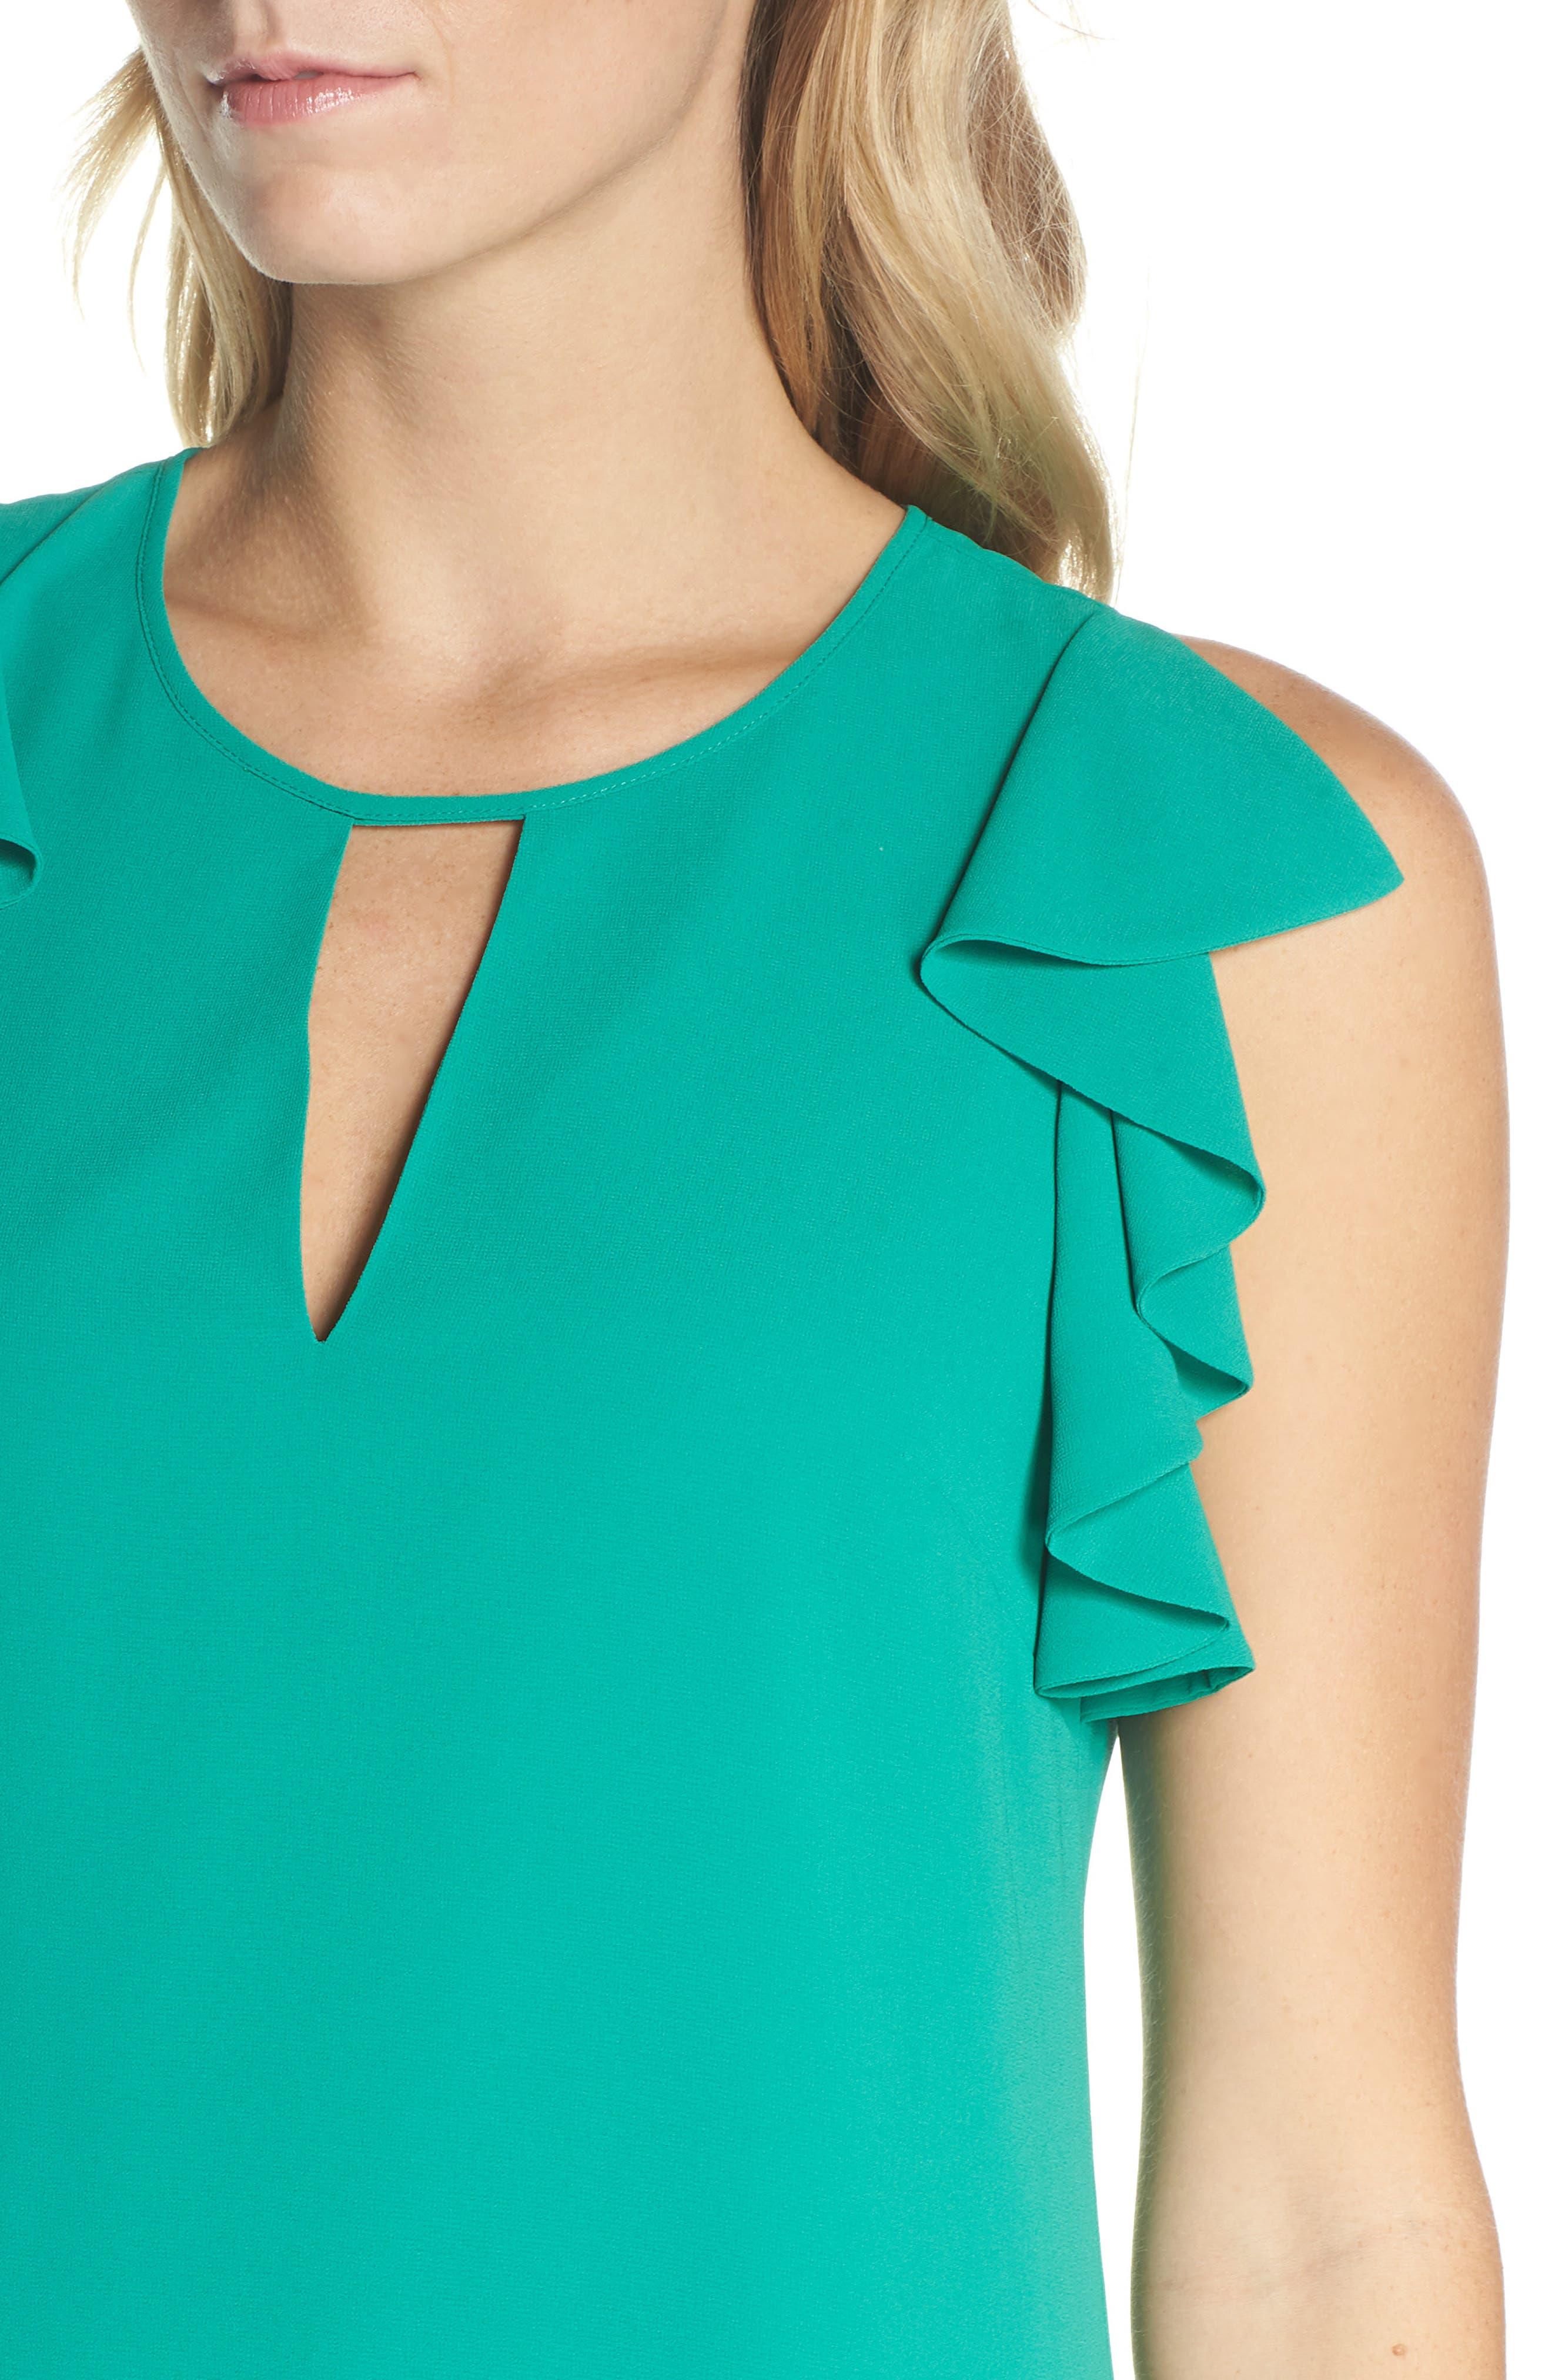 Soufflé Ruffle Chiffon Shift Dress,                             Alternate thumbnail 4, color,                             Green